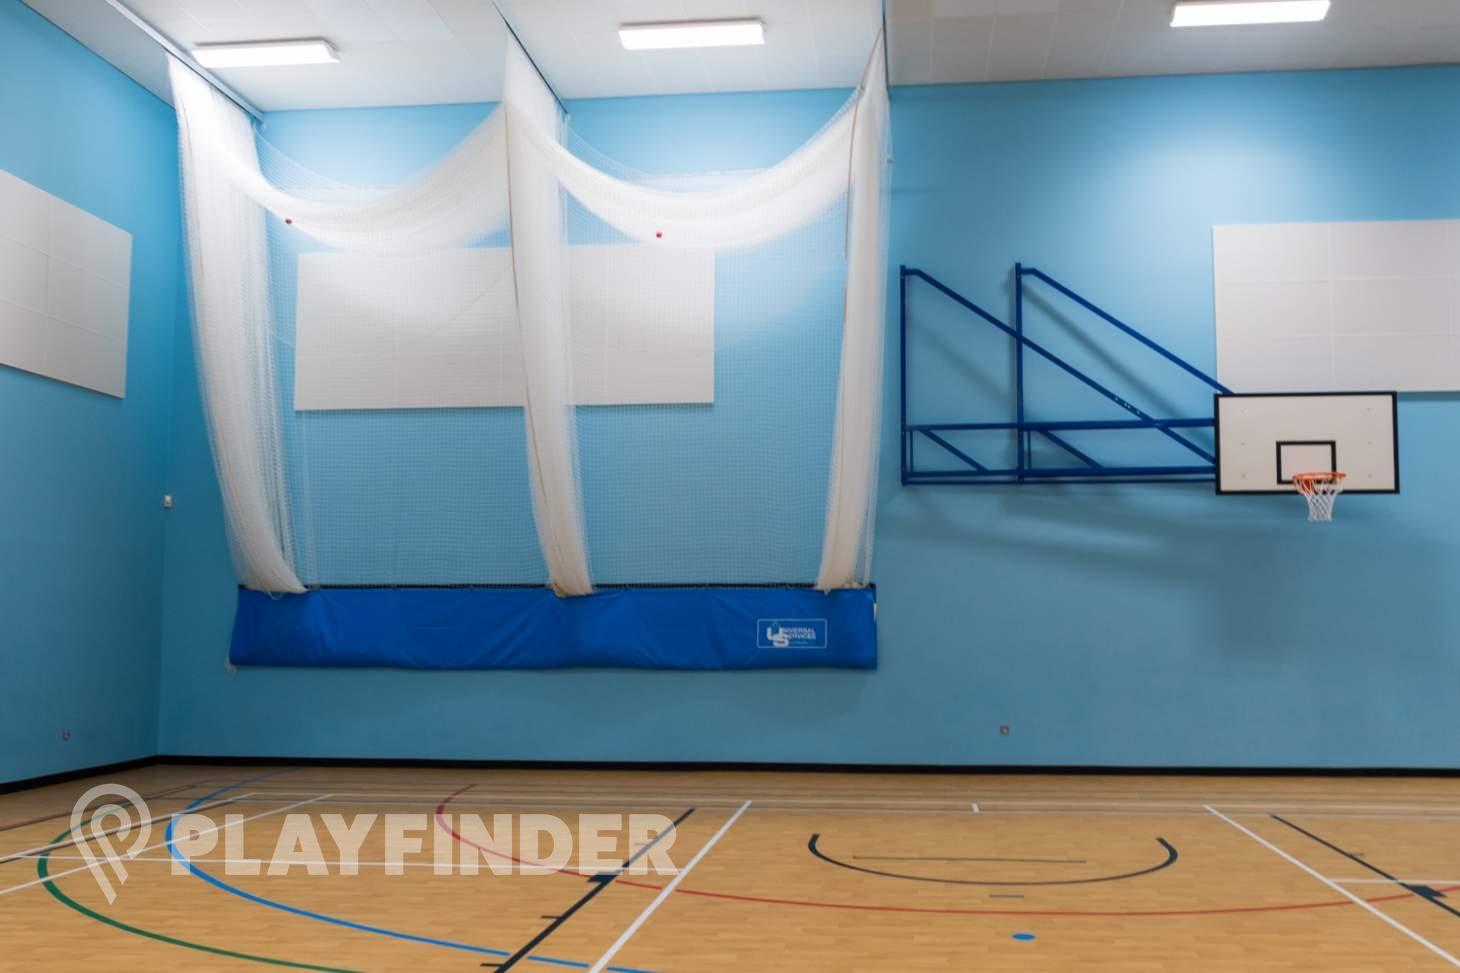 Manchester Enterprise Academy Central Nets | Indoor cricket facilities